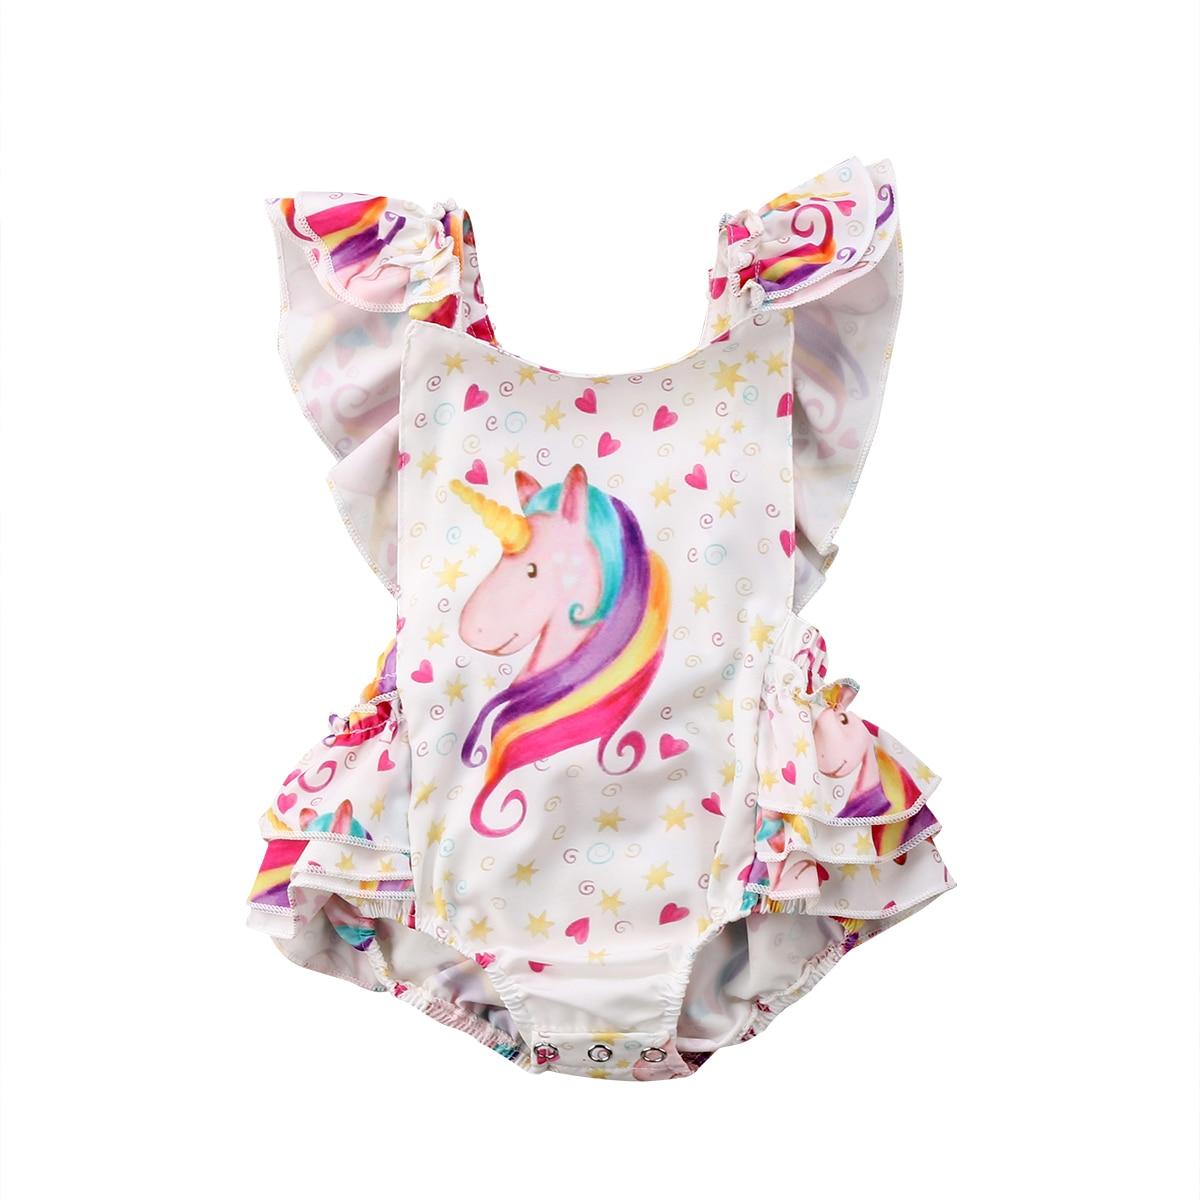 695f6c43b26f HOT SALE ~ 0-3Y Cute Kid Baby Girls Unicorn Backless Romper Newborn ...